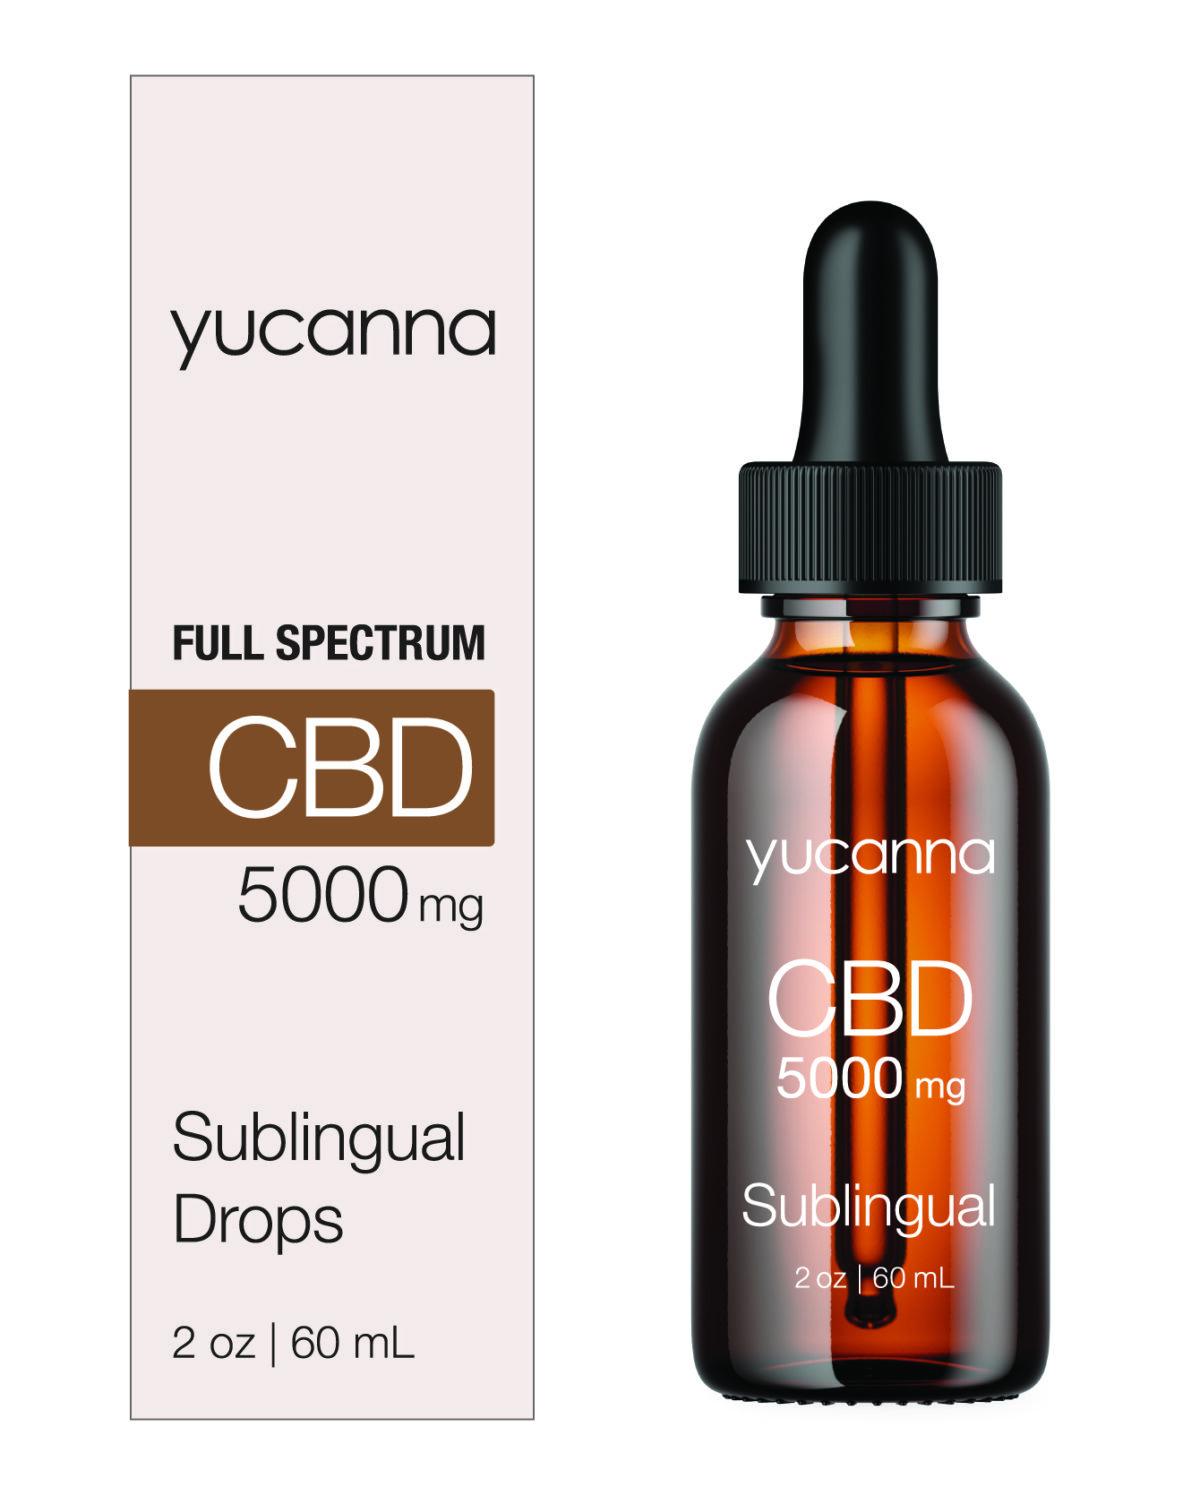 Yucanna Simple and Powerful CBD 5000 mg with Box